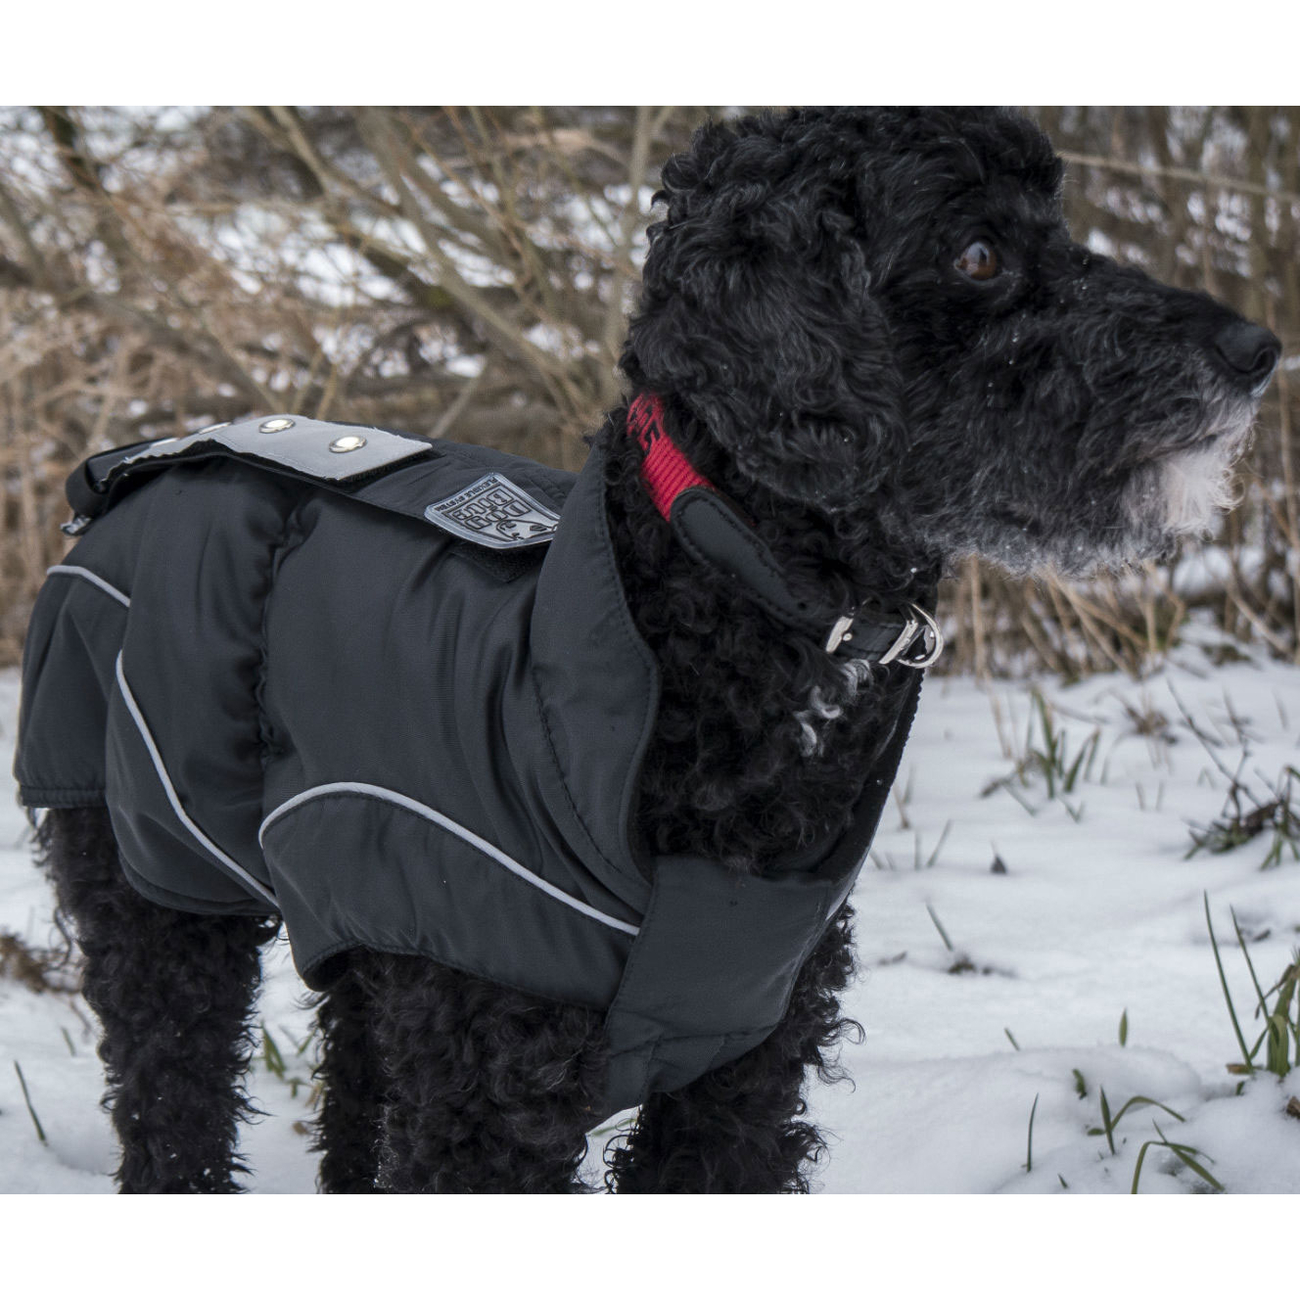 DogBite Hunde Leucht-Winterjacke mit LED